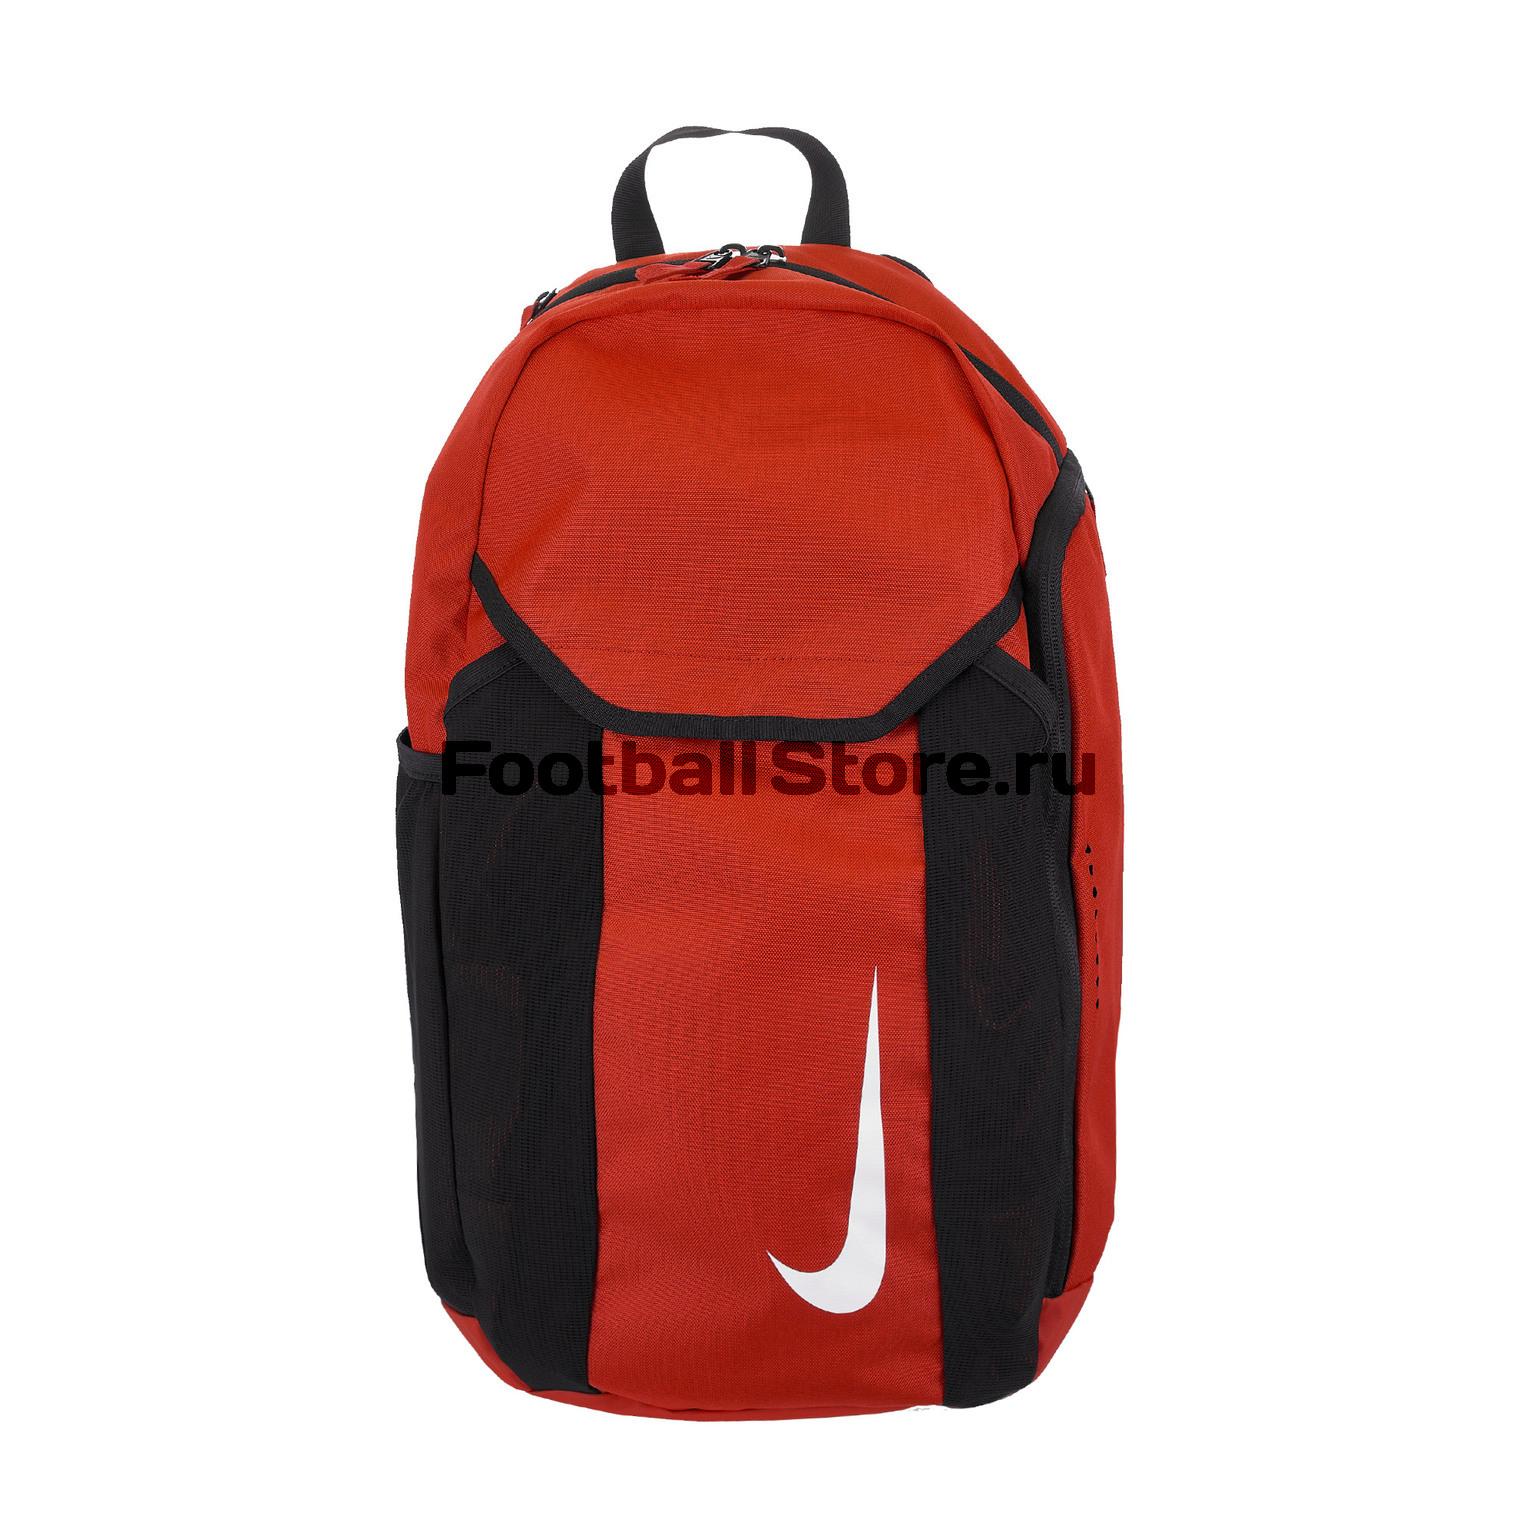 Рюкзак Nike Academy Team BA5501-657 кресло складное green glade 52 см х 52 см х 46 110 см